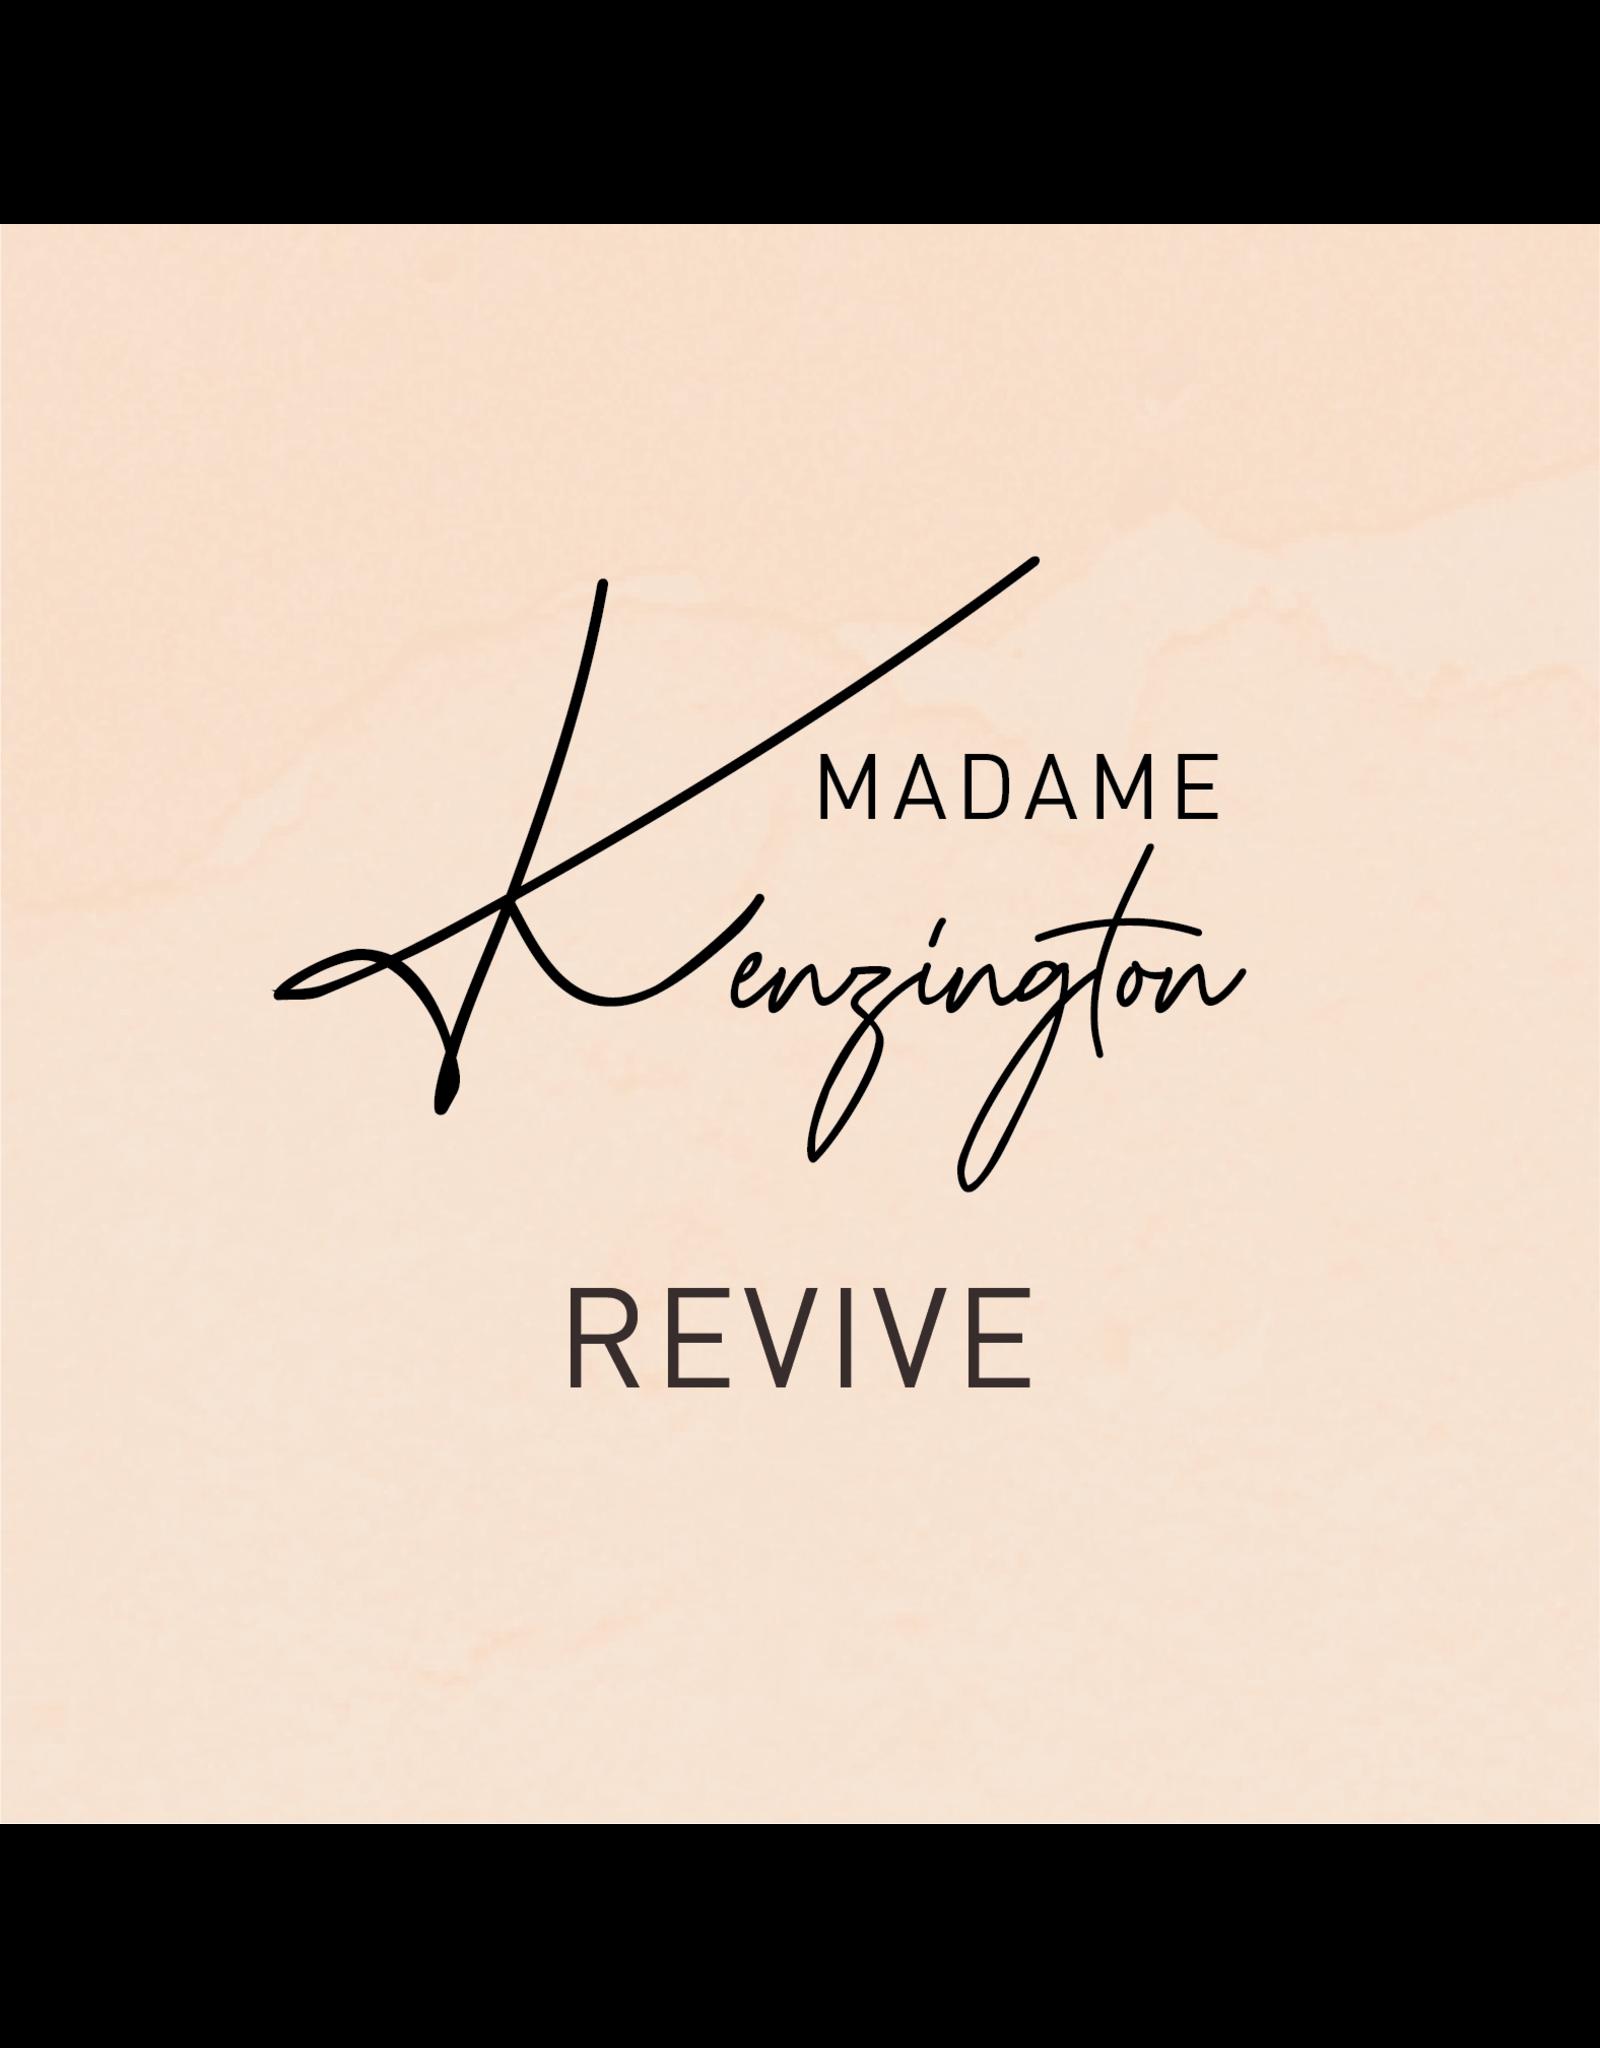 Madame Kenzington Madame Kenzington REVIVE